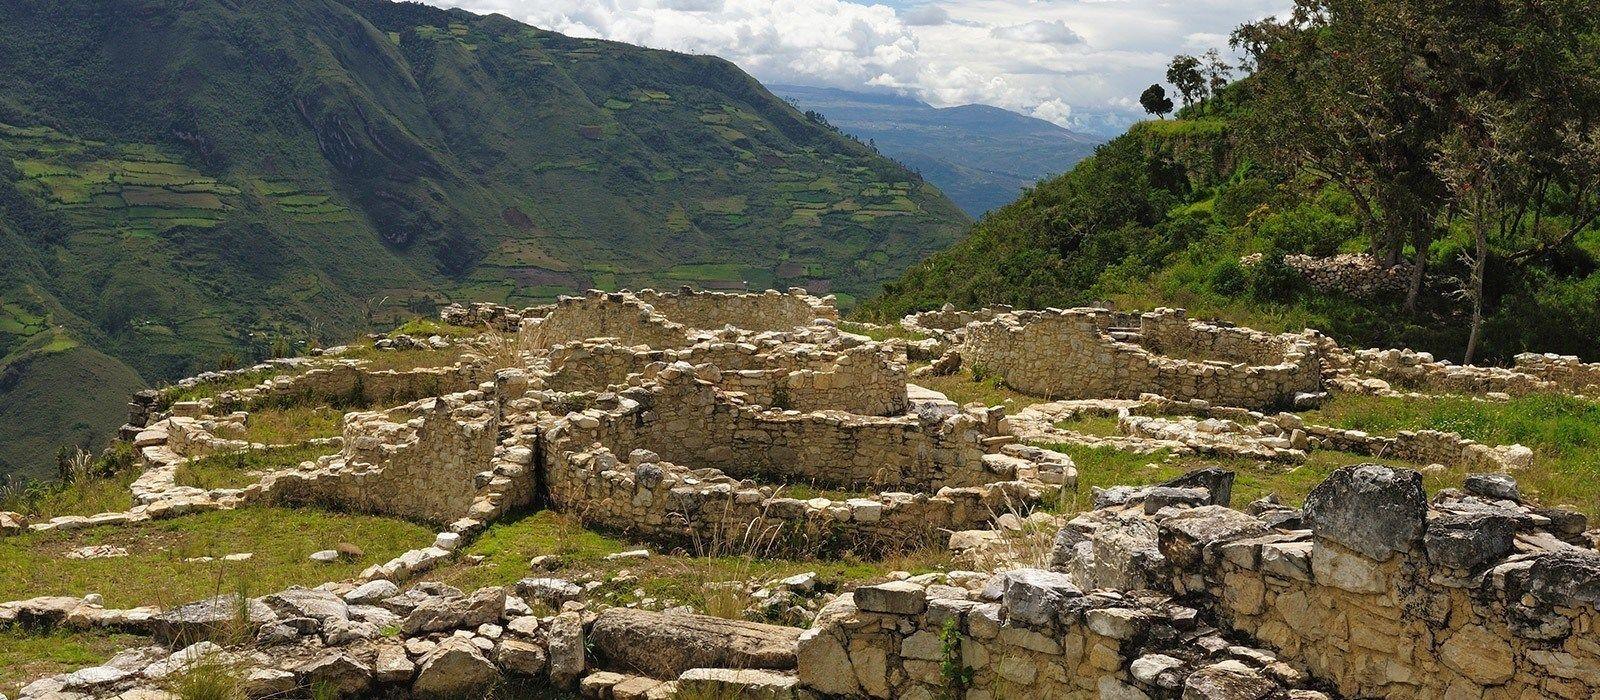 Reiseziel Leymebamba Peru